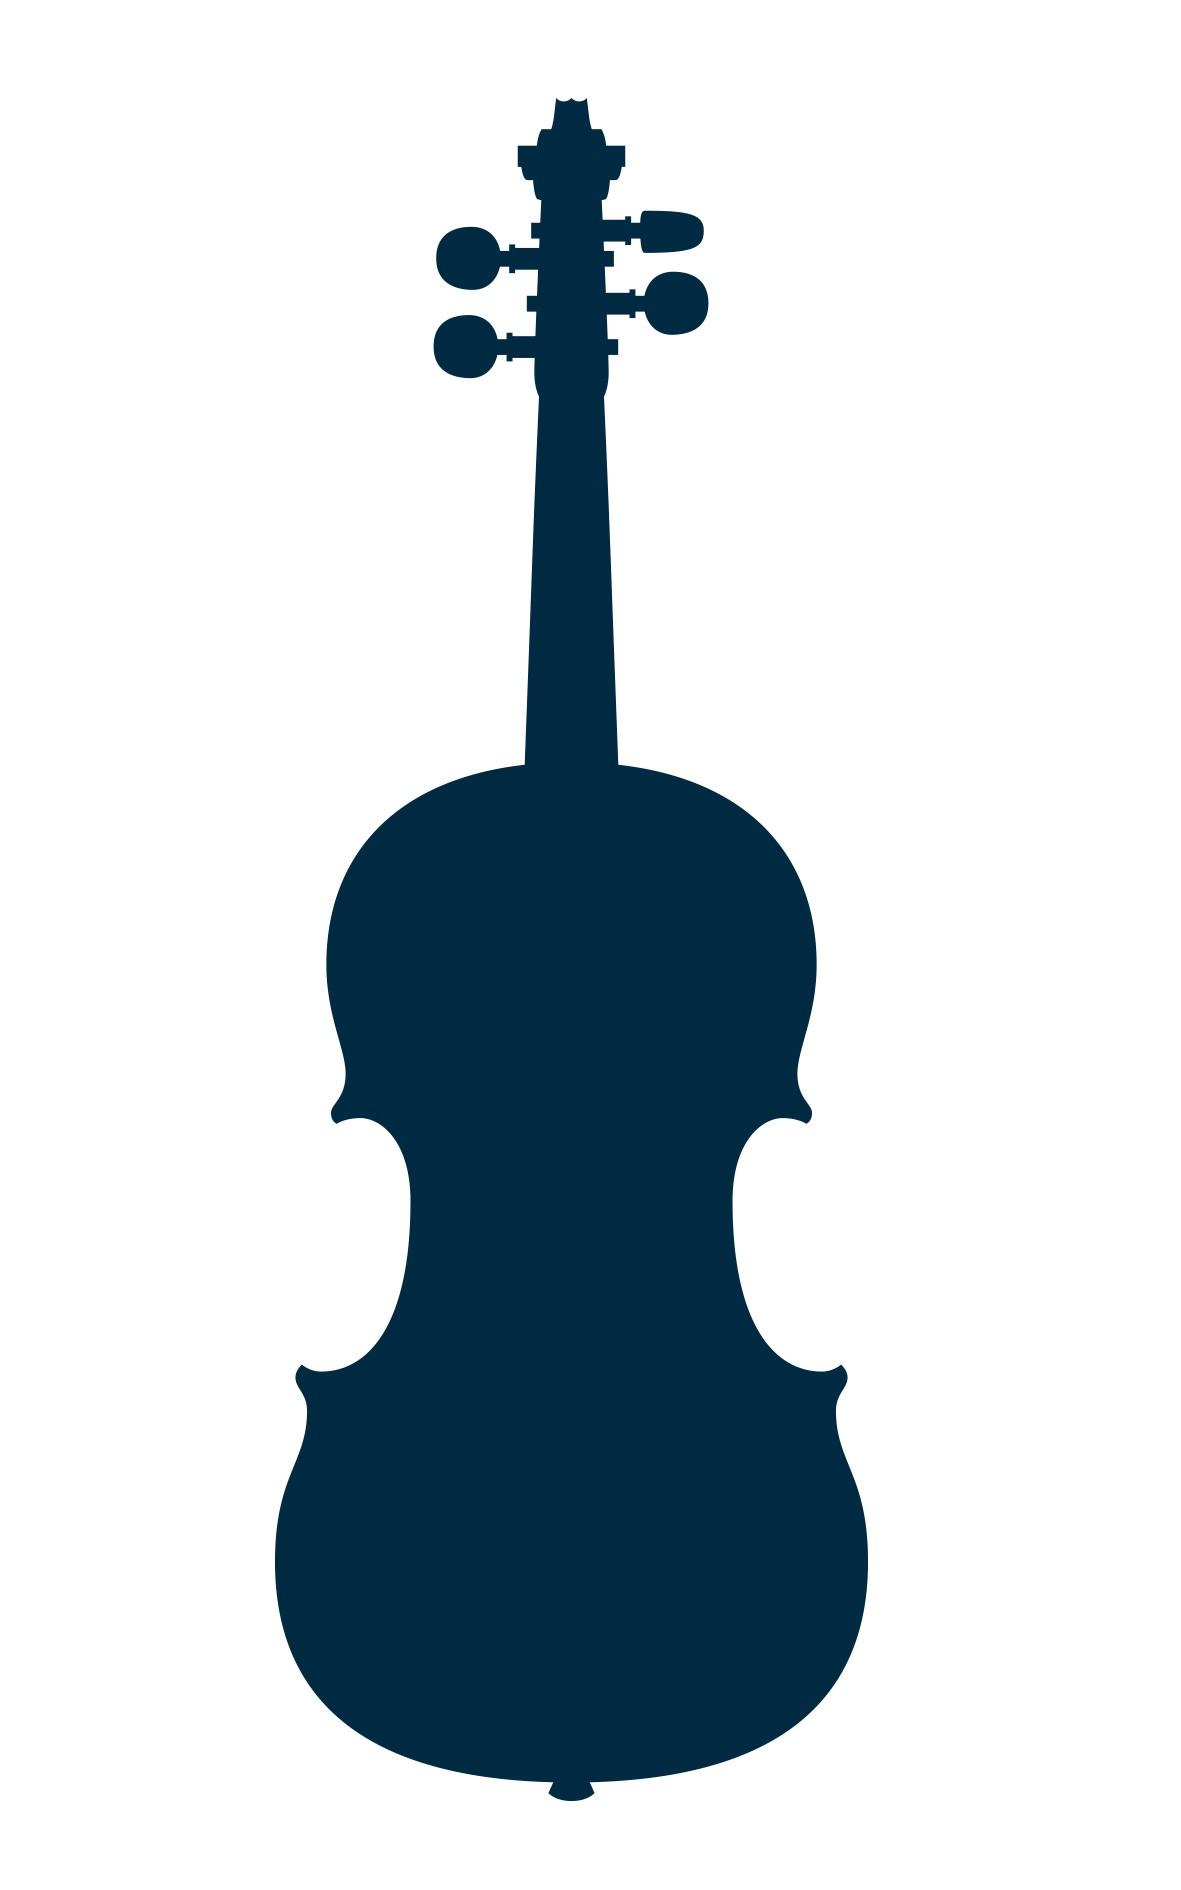 Antonio Lorenzi violin, Mirecourt